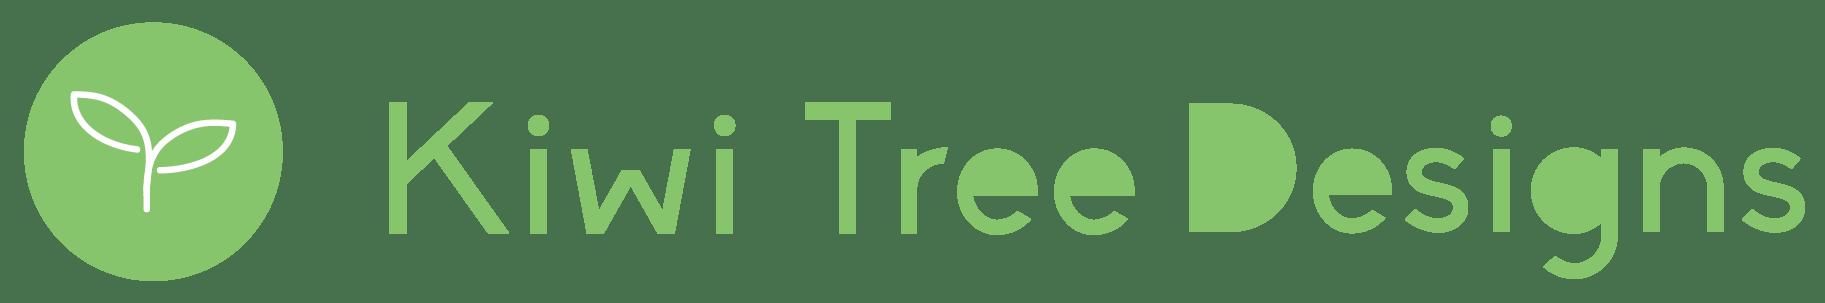 Kiwi Tree Designs